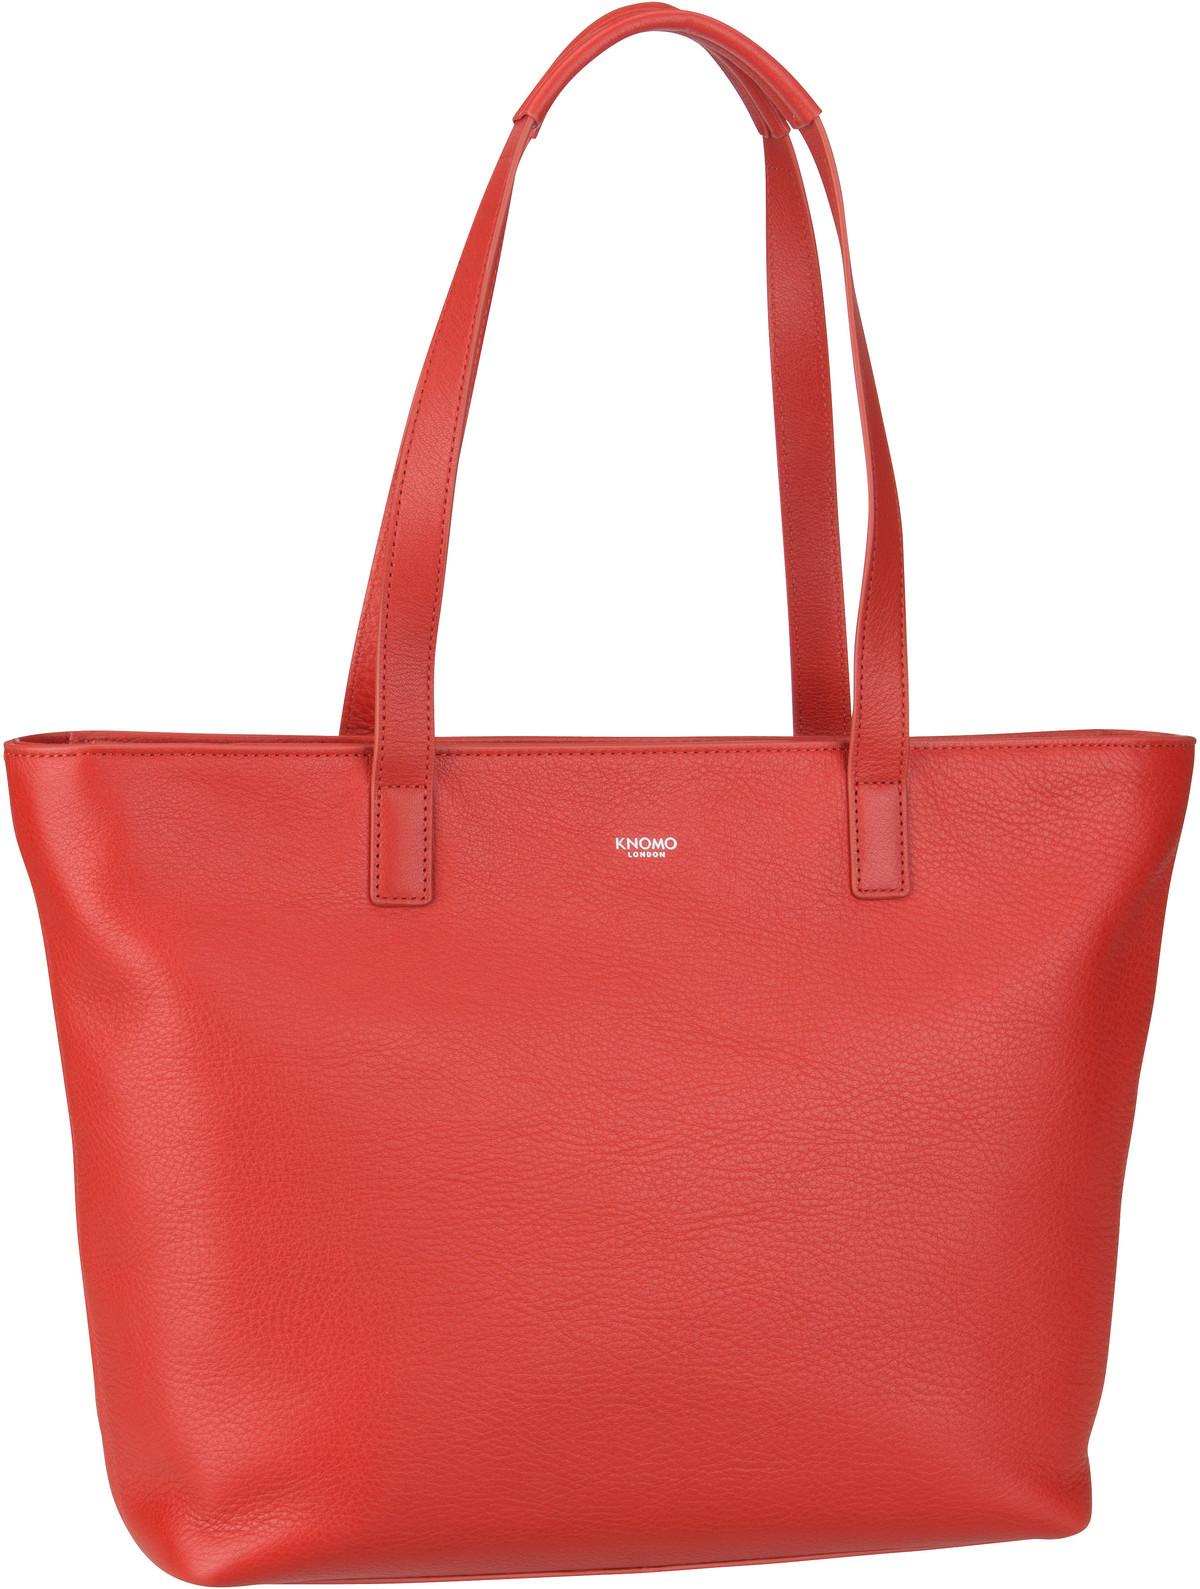 Handtasche Mayfair Luxe Mini Maddox 13'' Lava (8.9 Liter)